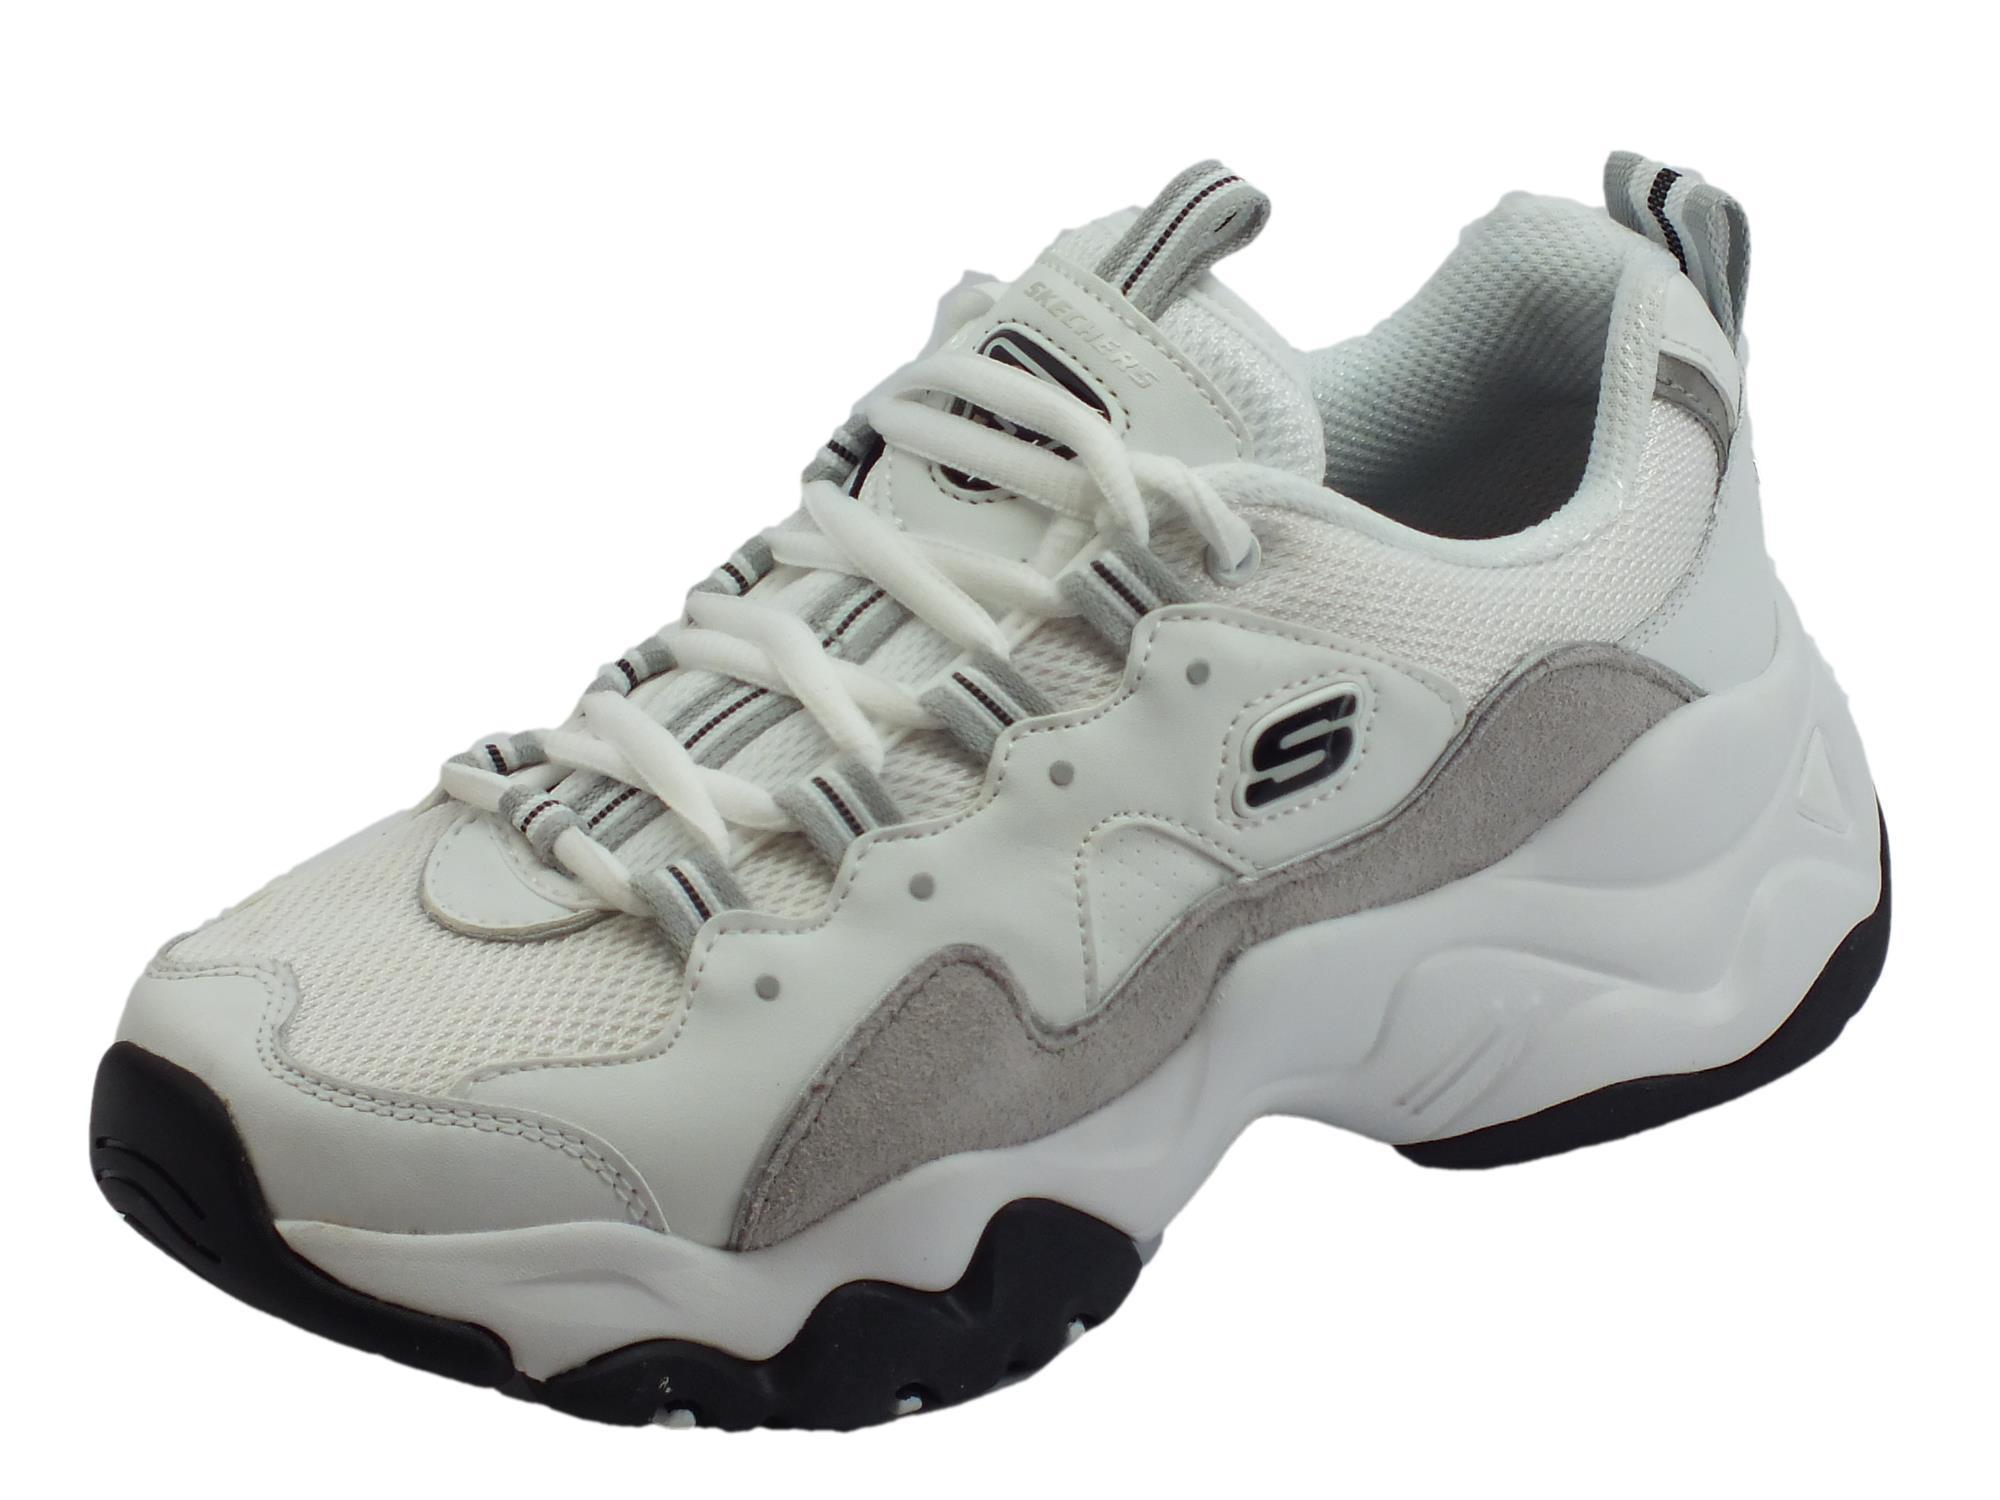 Skechers D'Lites 3.0 ZenWay Scarpe Sportive per donna bianche e grigie